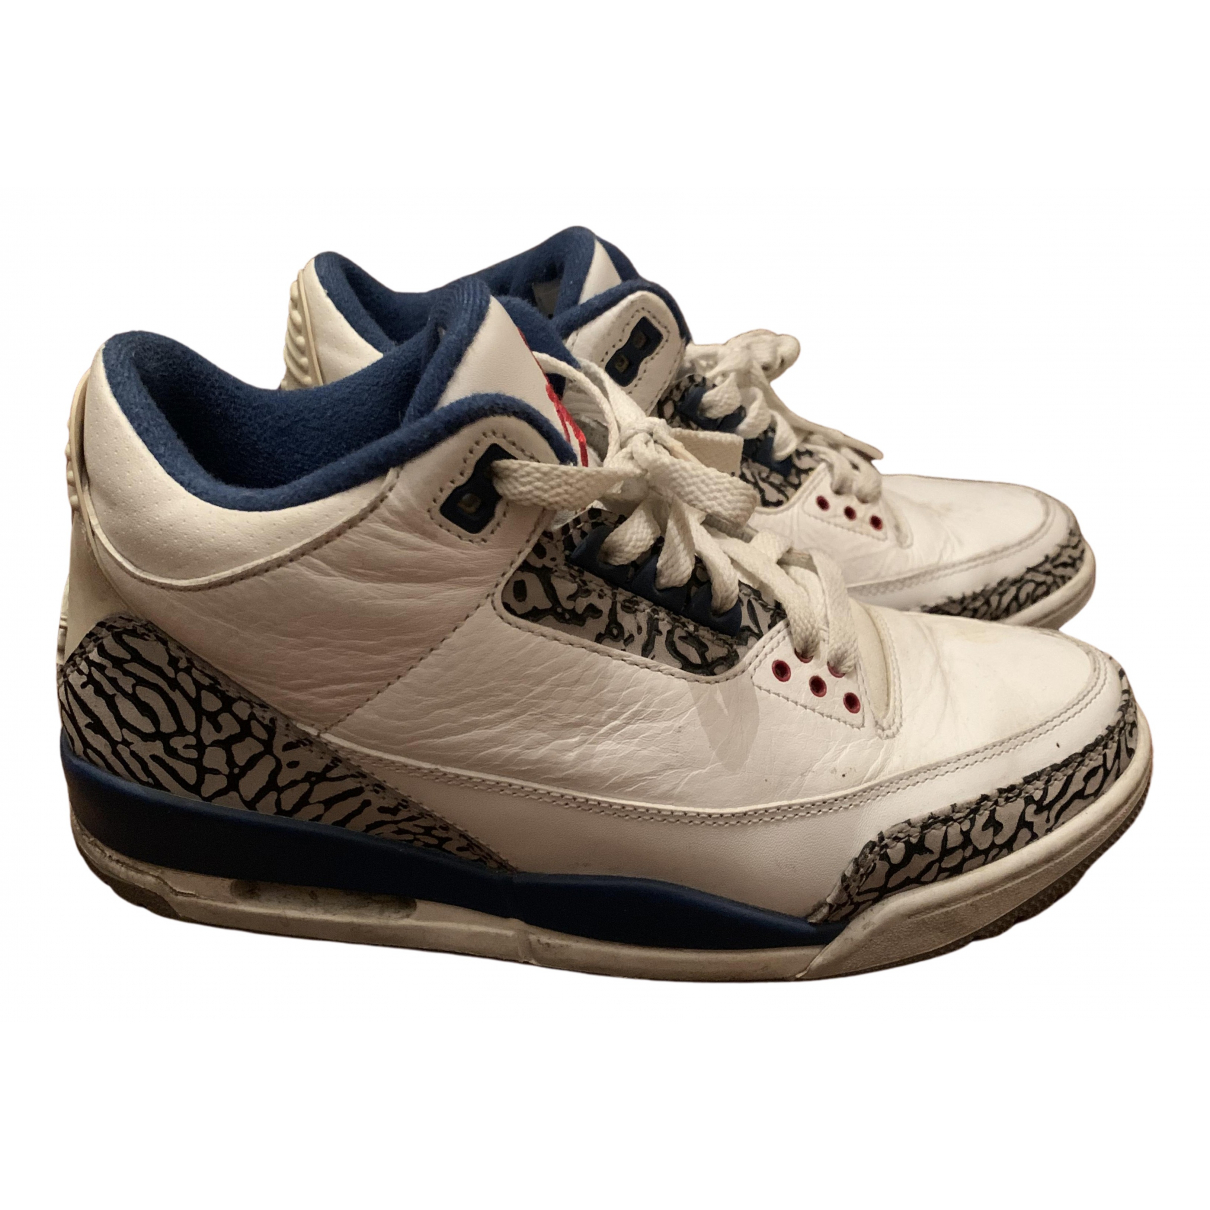 Jordan - Baskets Air Jordan 3 pour homme en cuir - blanc